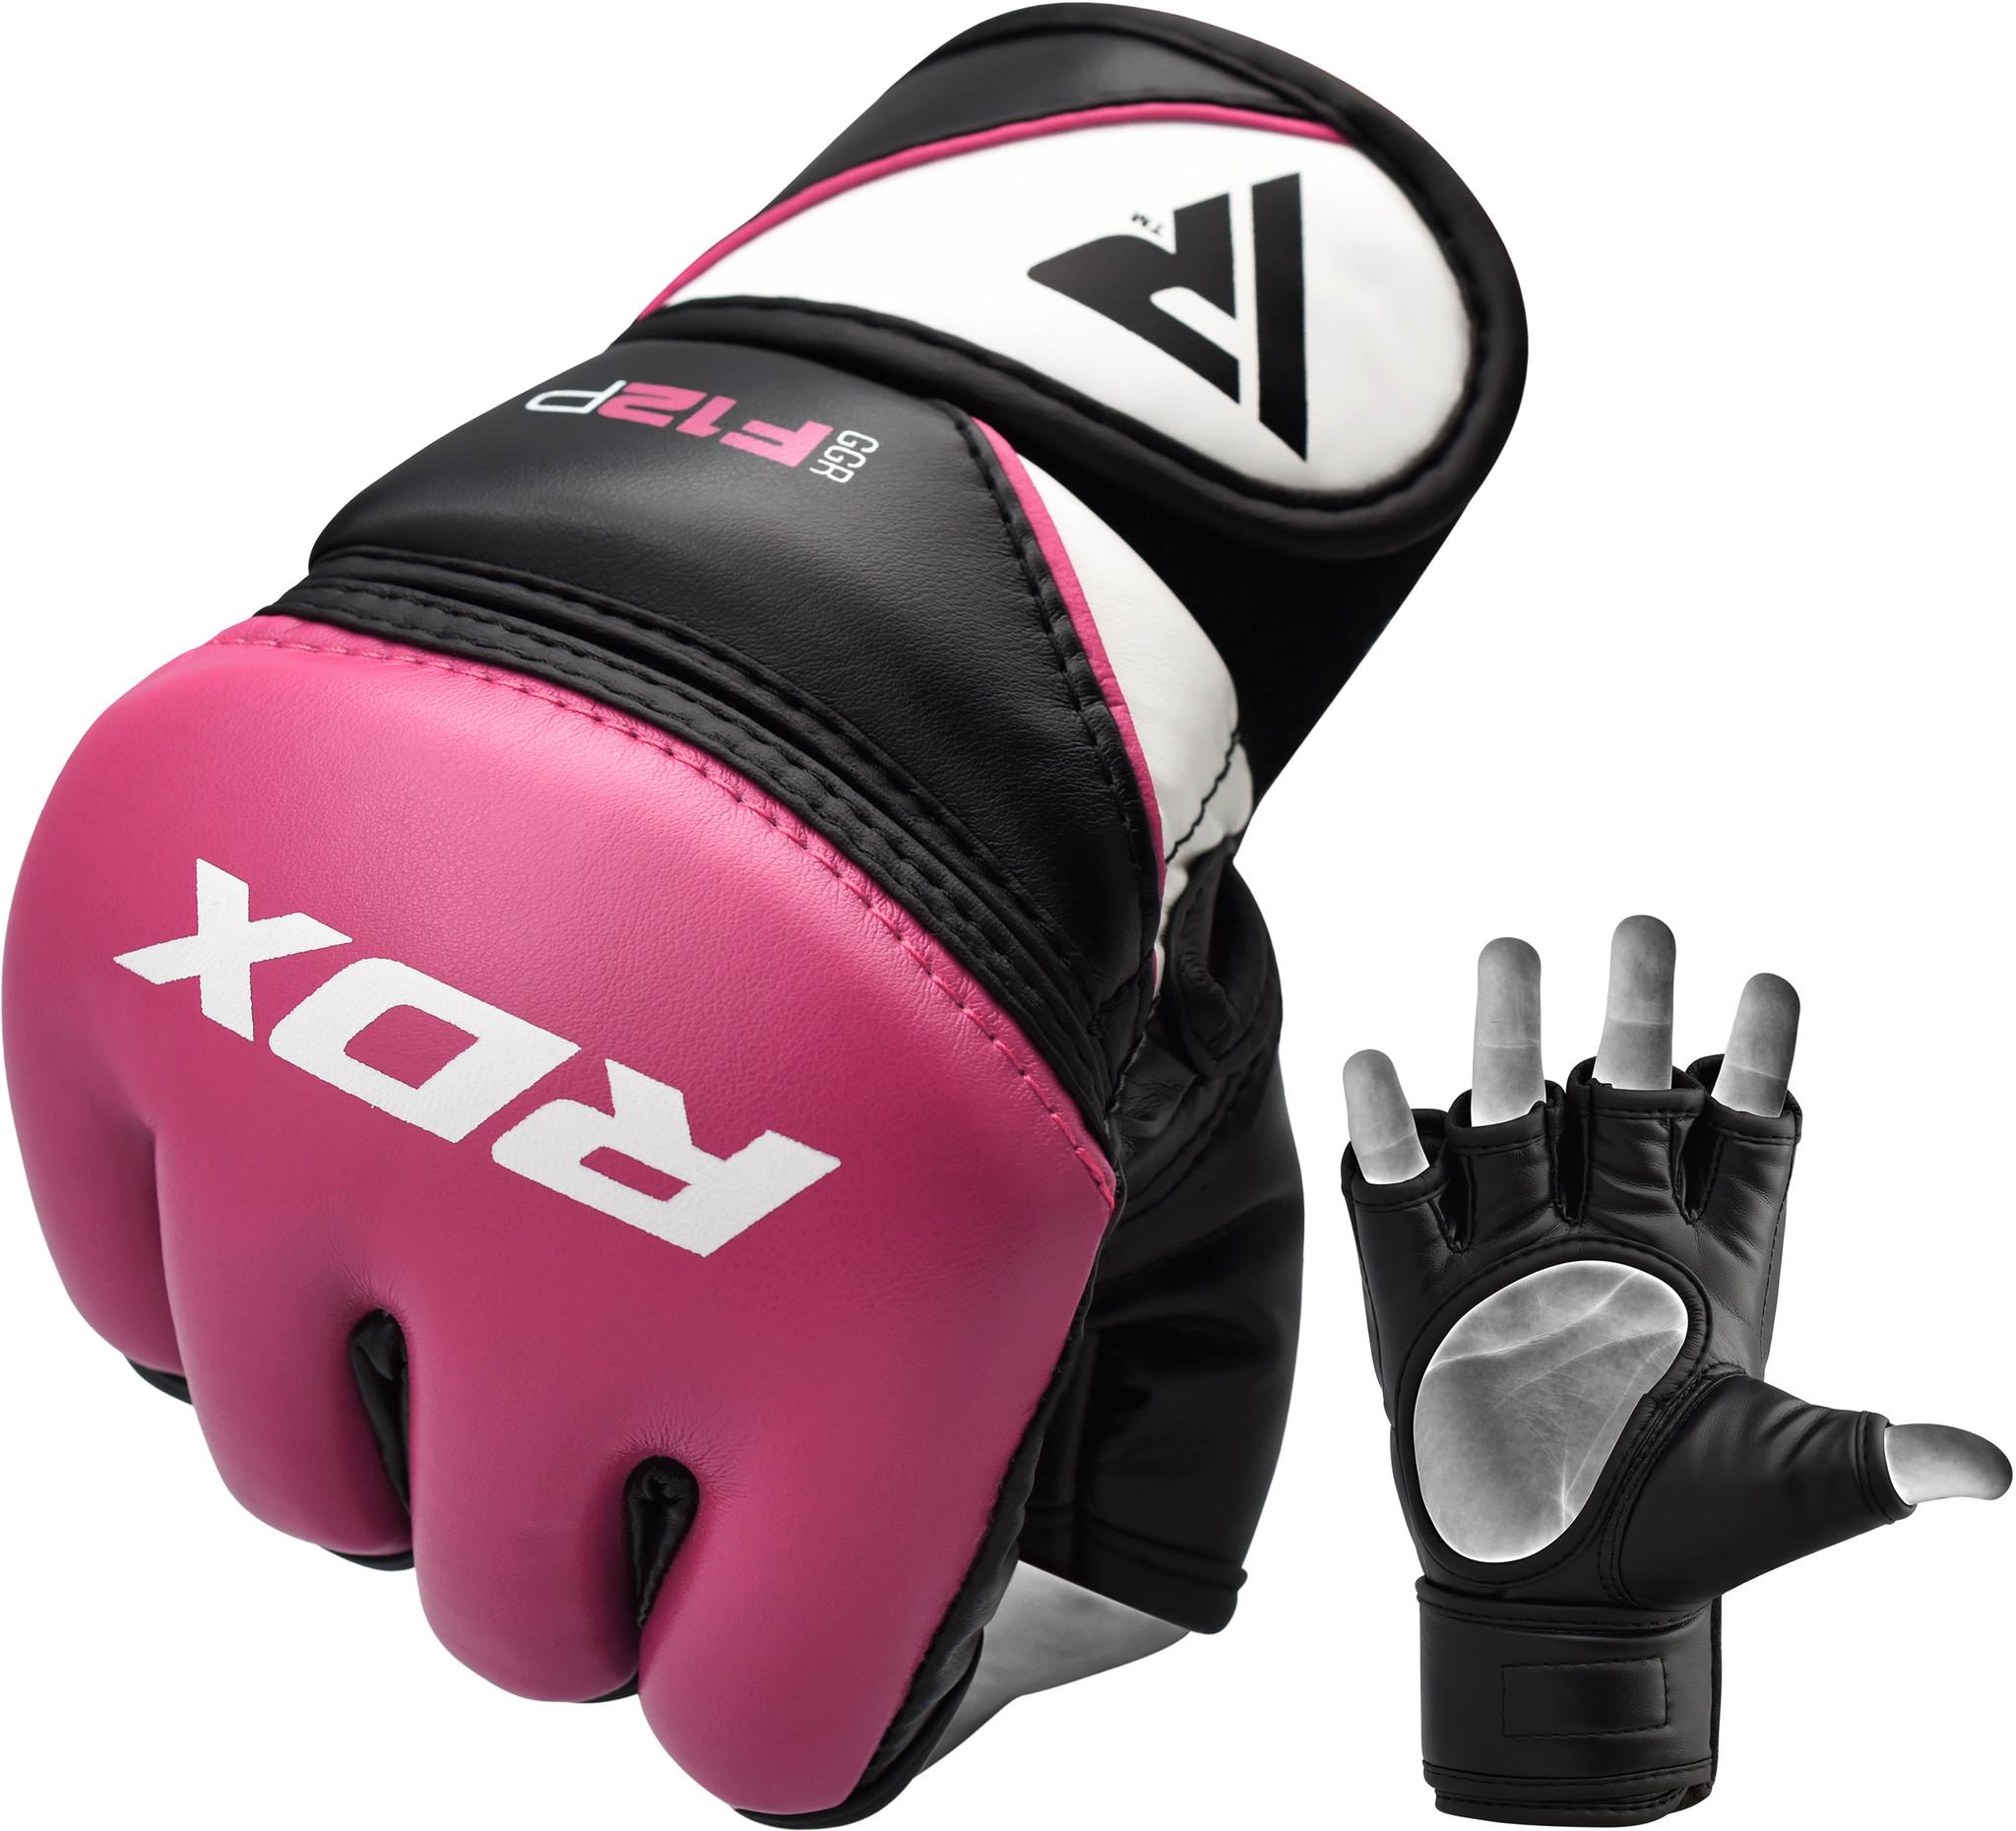 RDX Sports Grappling Gloves Model GGRF-12 - Roze-0